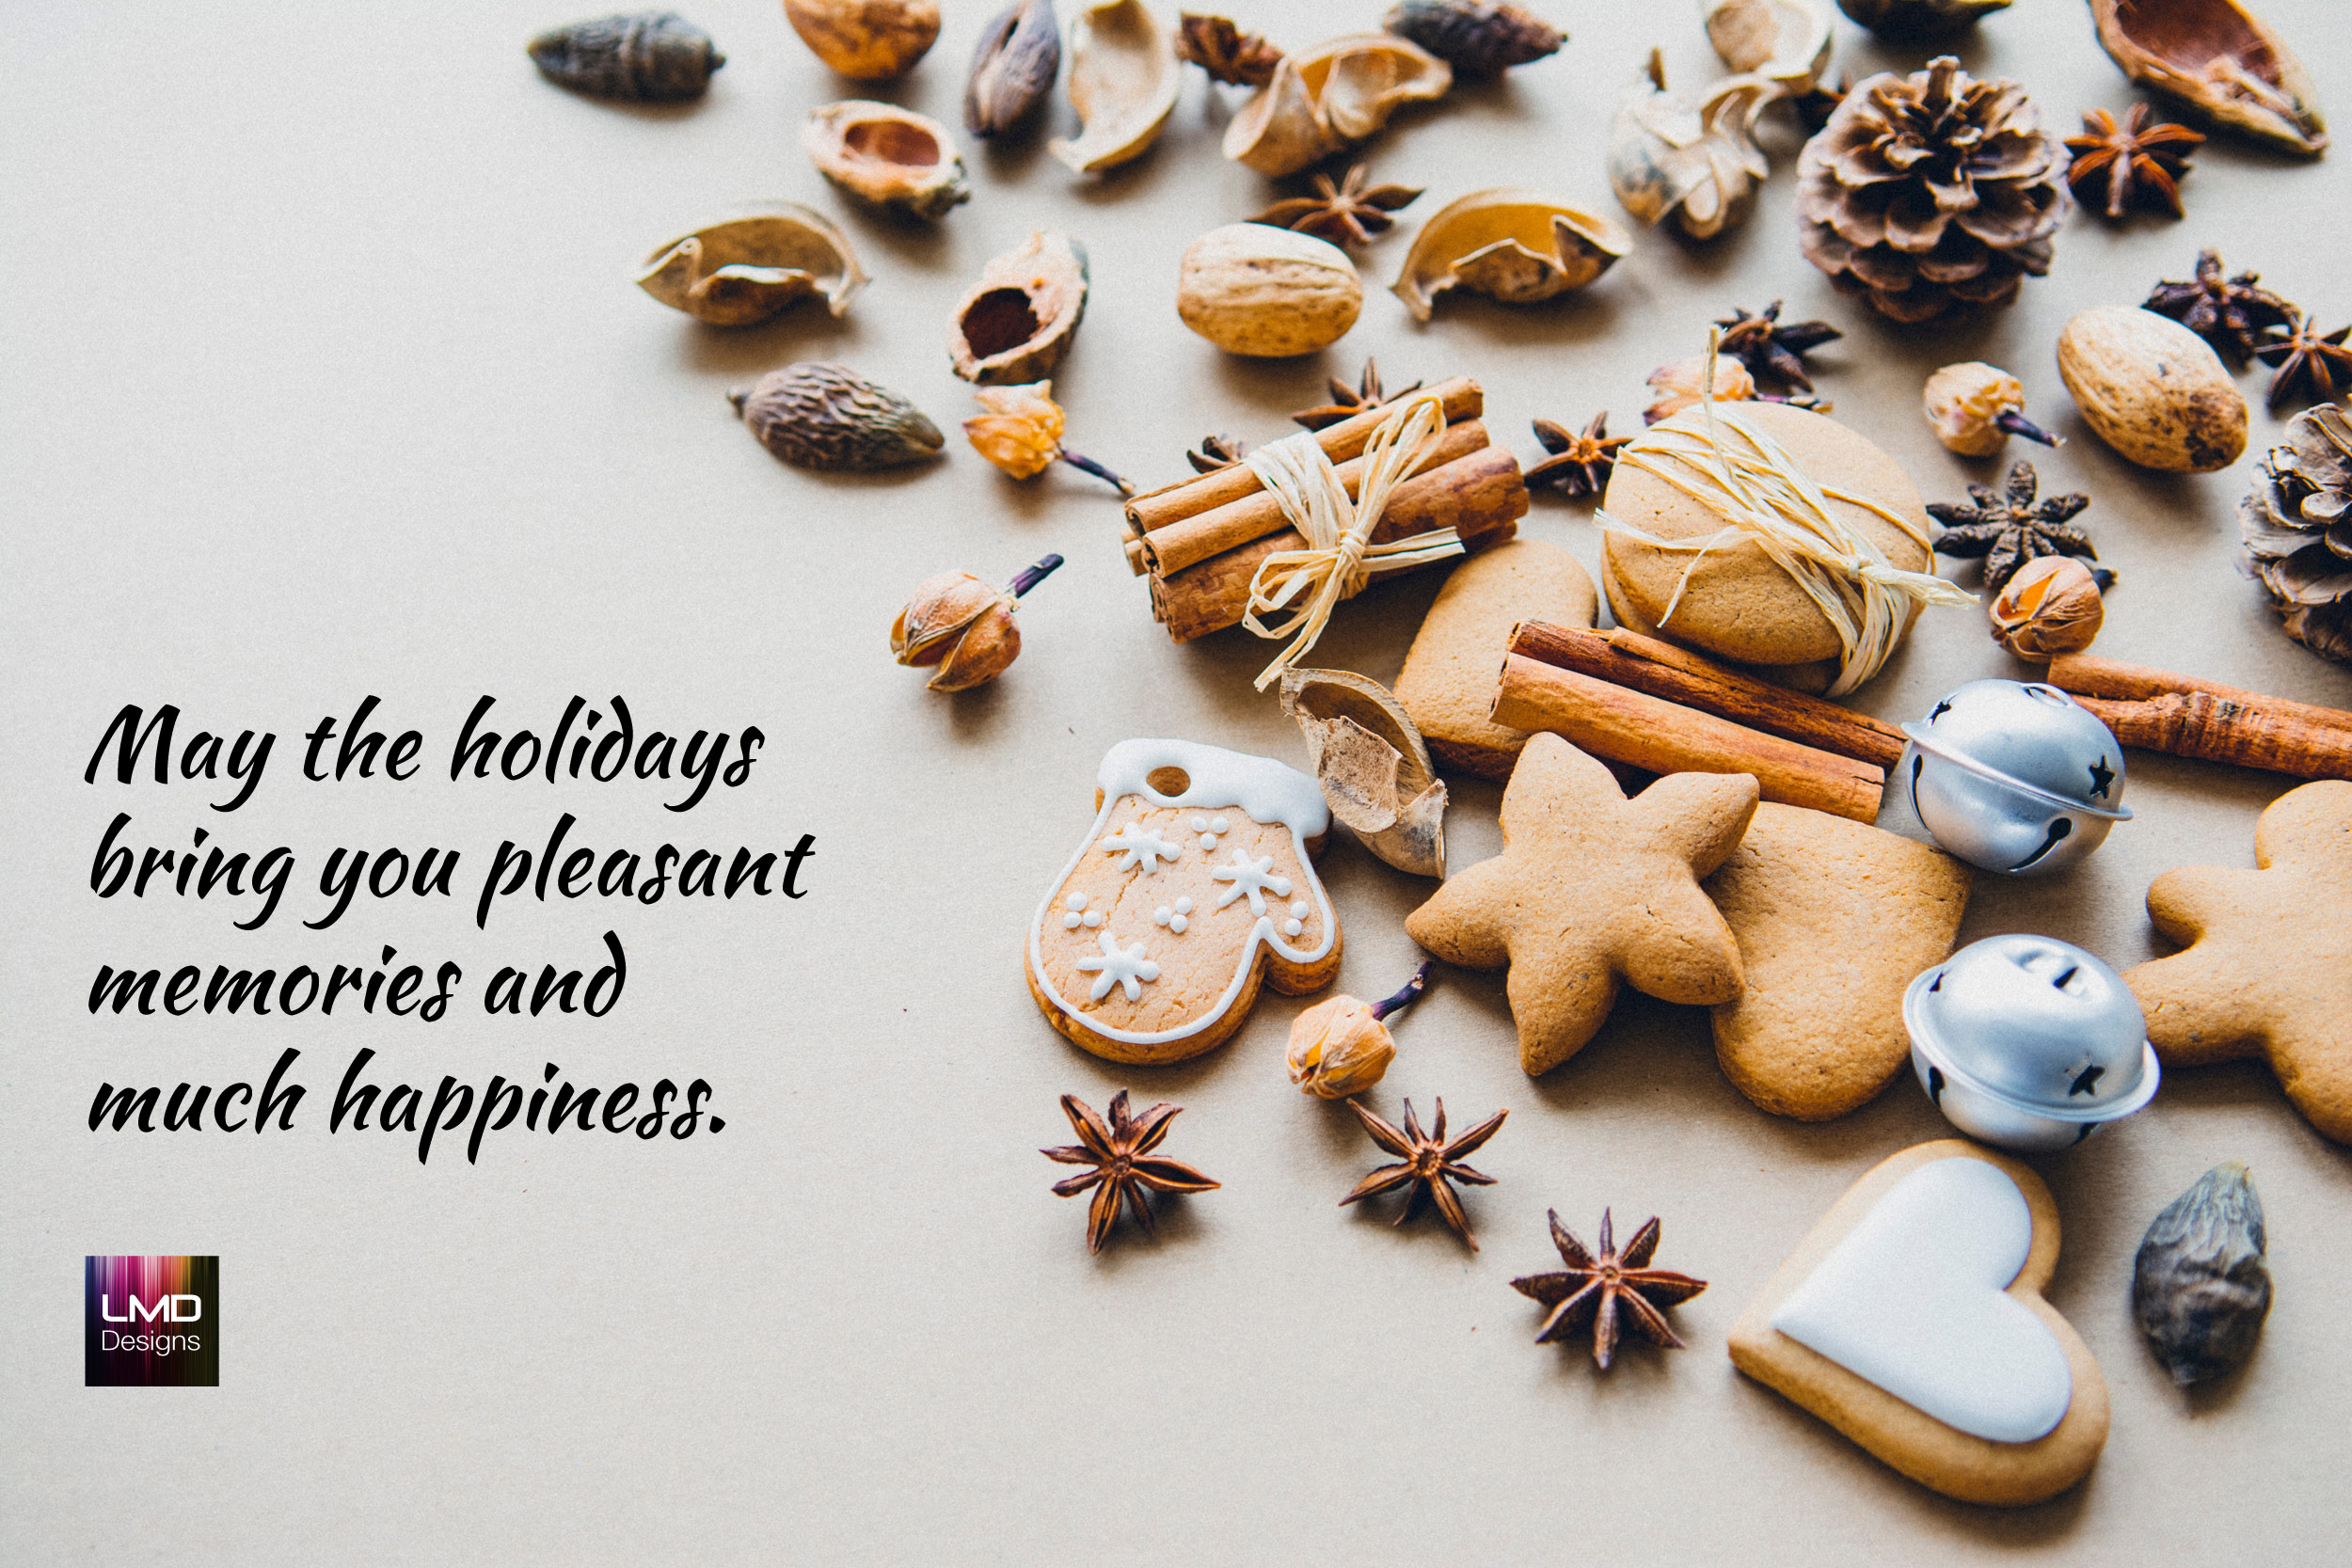 free-holiday-card-lmd.jpg